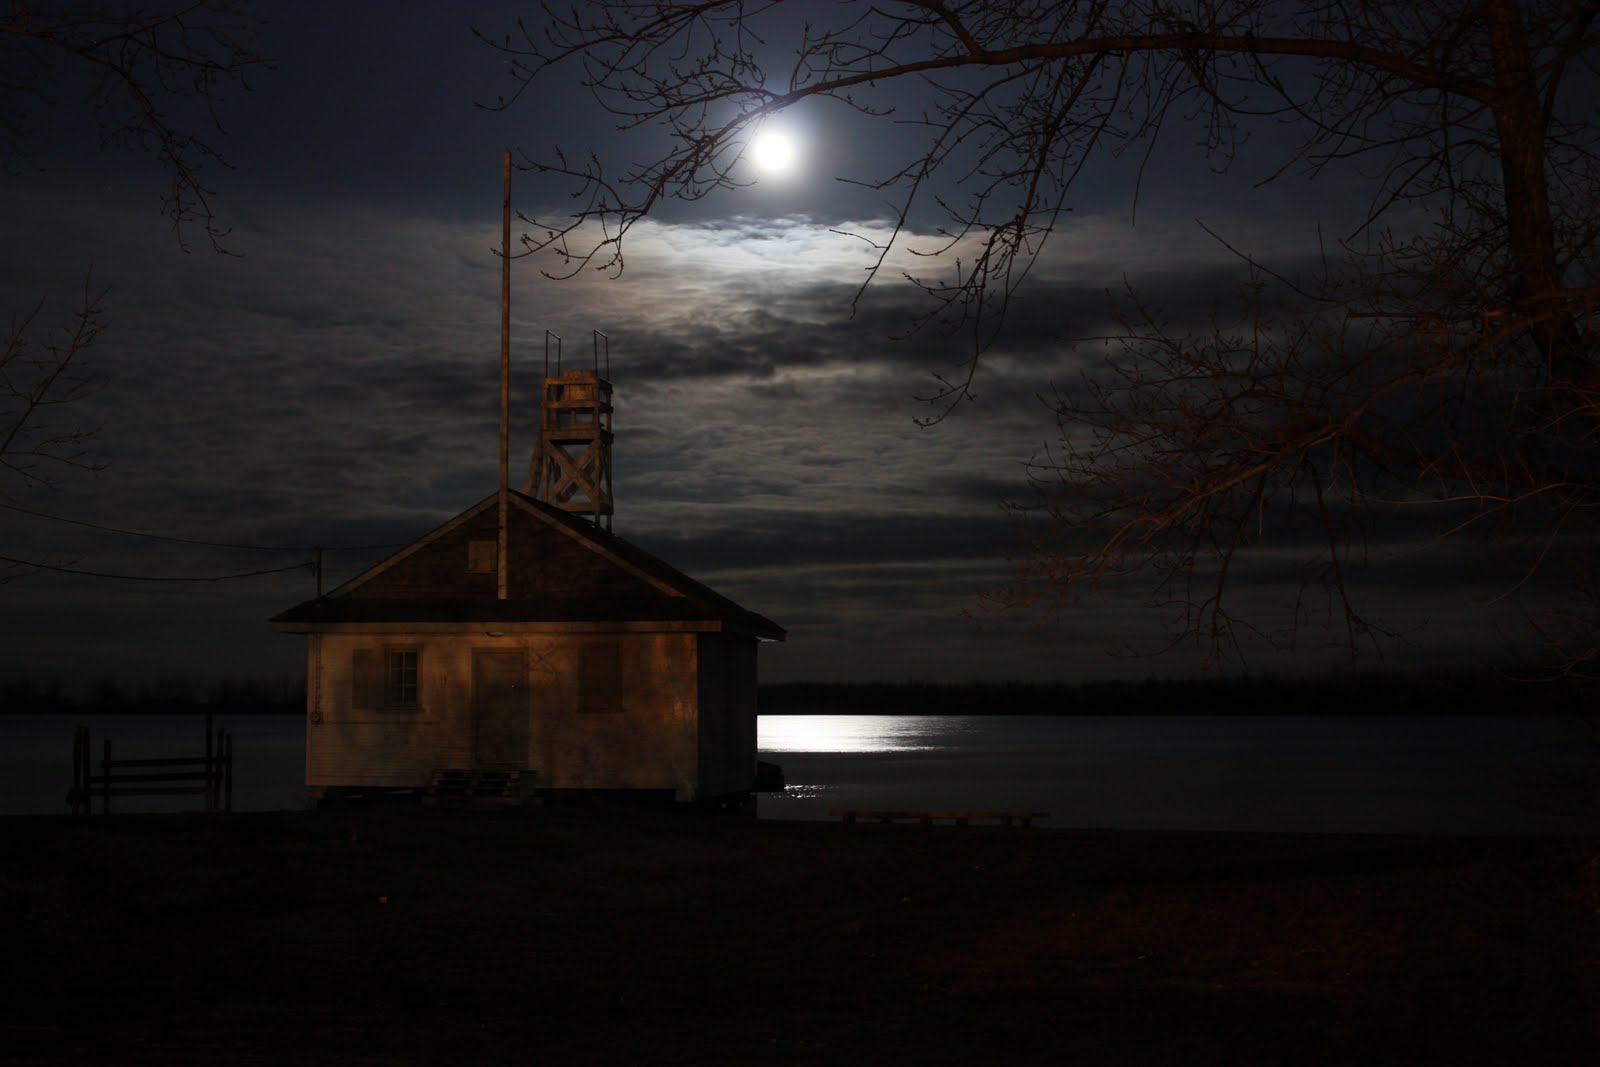 Niagara Falls At Night Wallpaper Full Moon Over Lake Ontario Bounding Over Our Steps